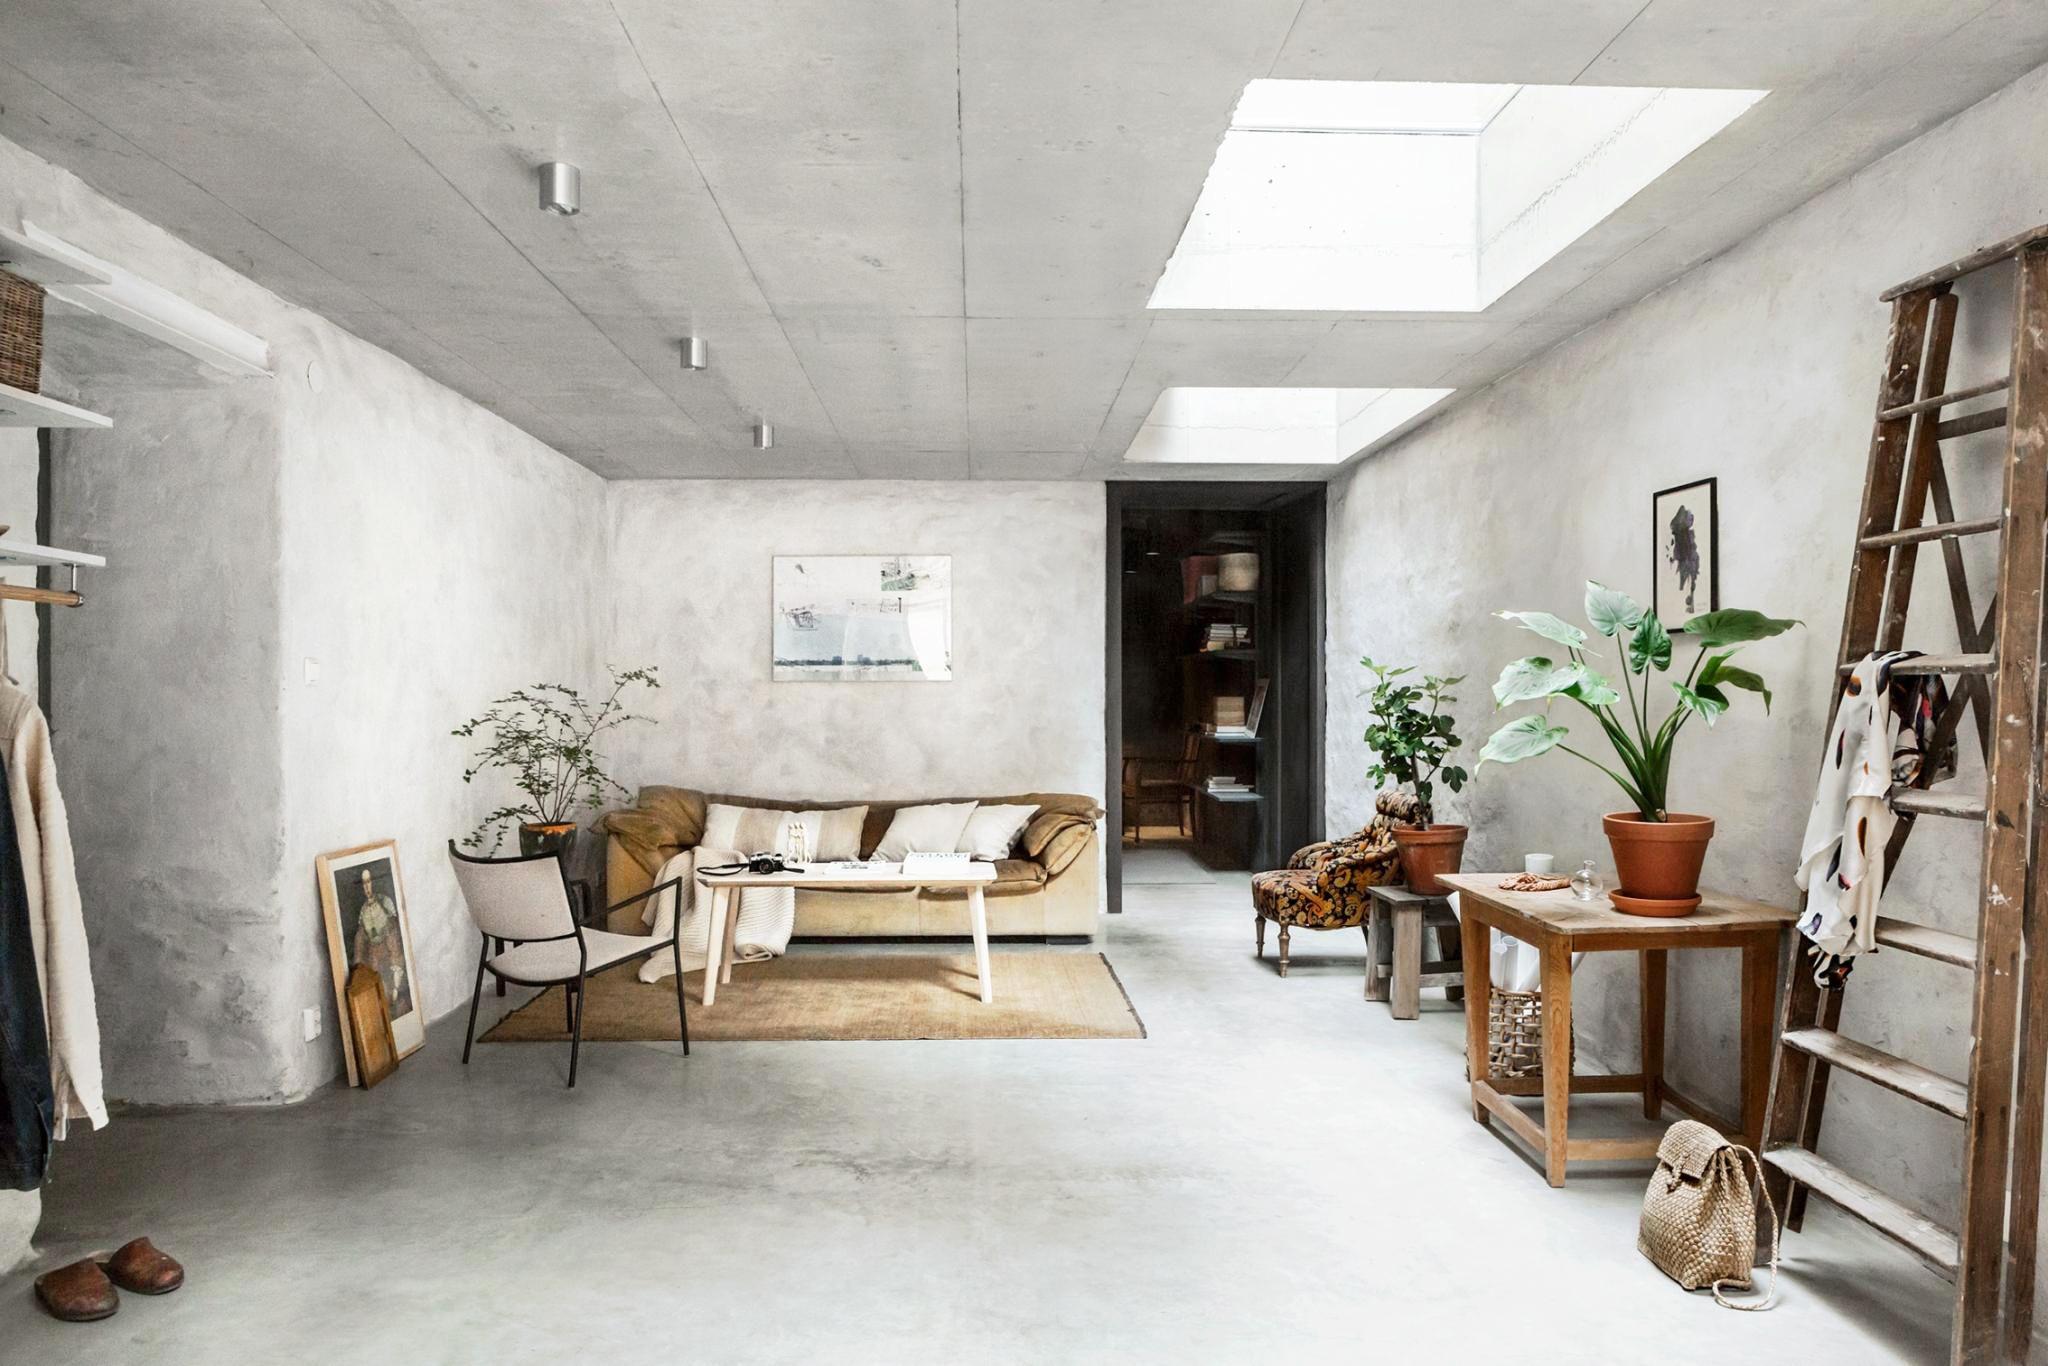 Minimalist High Ceiling Small House Design